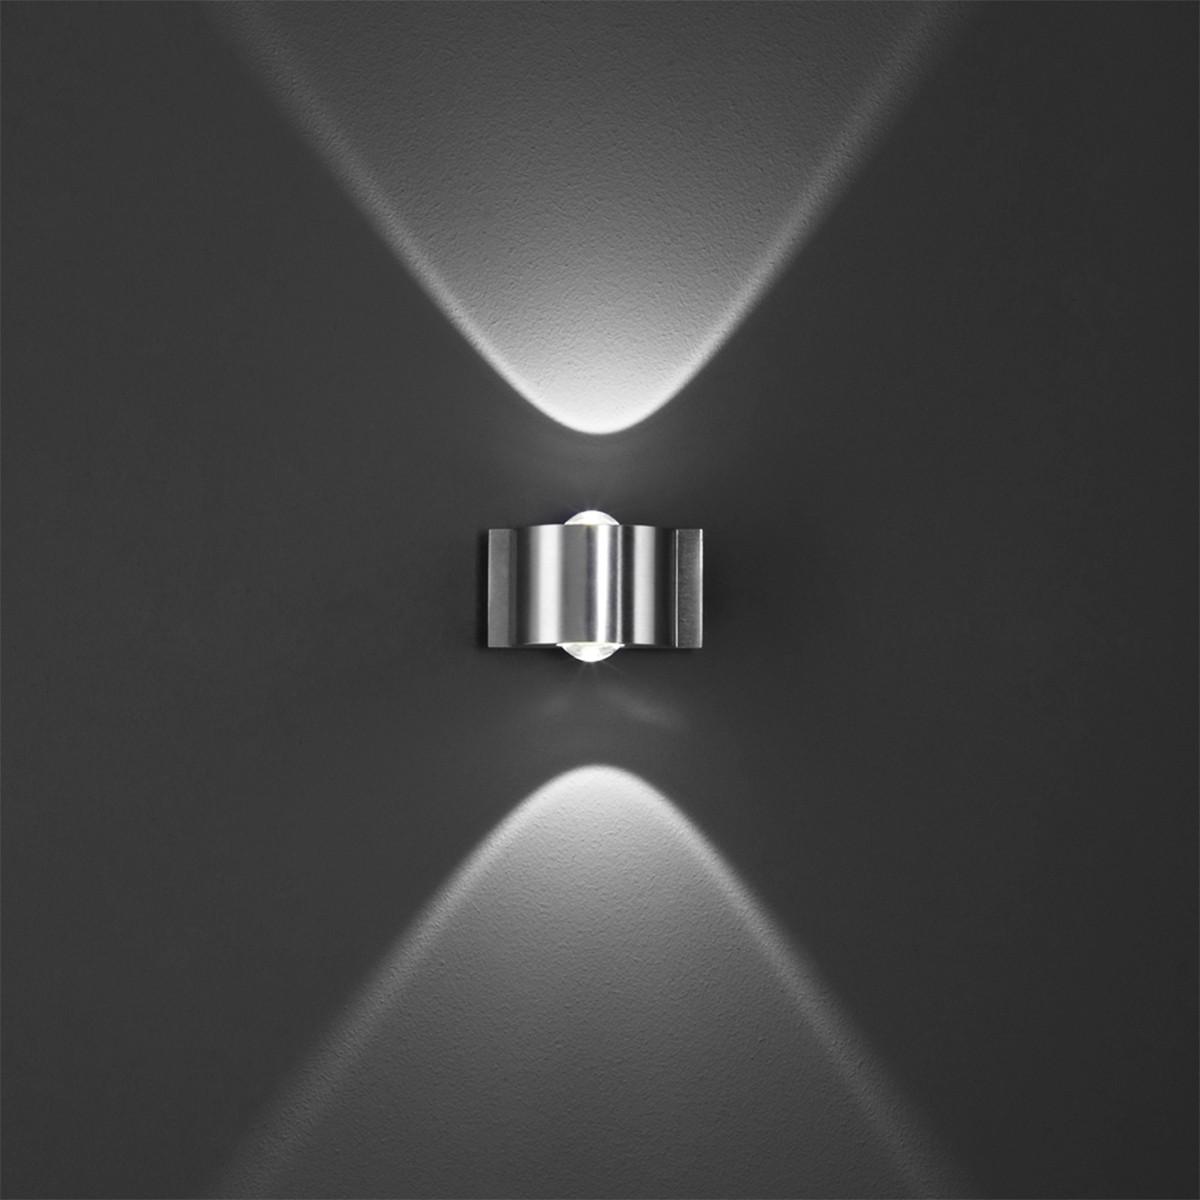 B-Leuchten Stream LED Wandleuchte, 2-flg., Aluminium